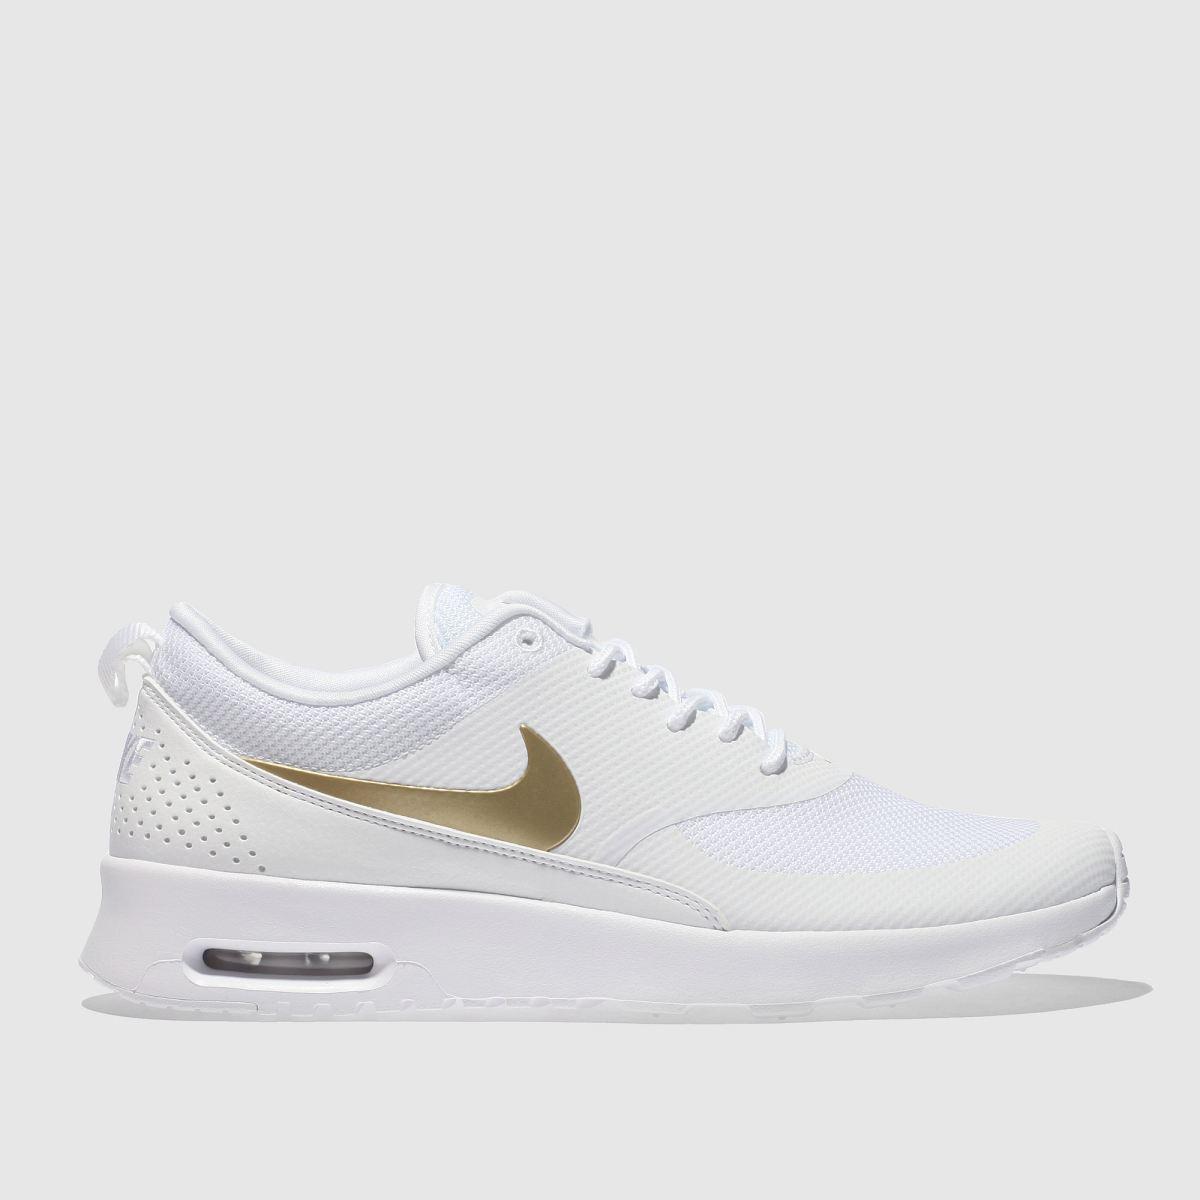 Nike White & Gold Air Max Thea Trainers